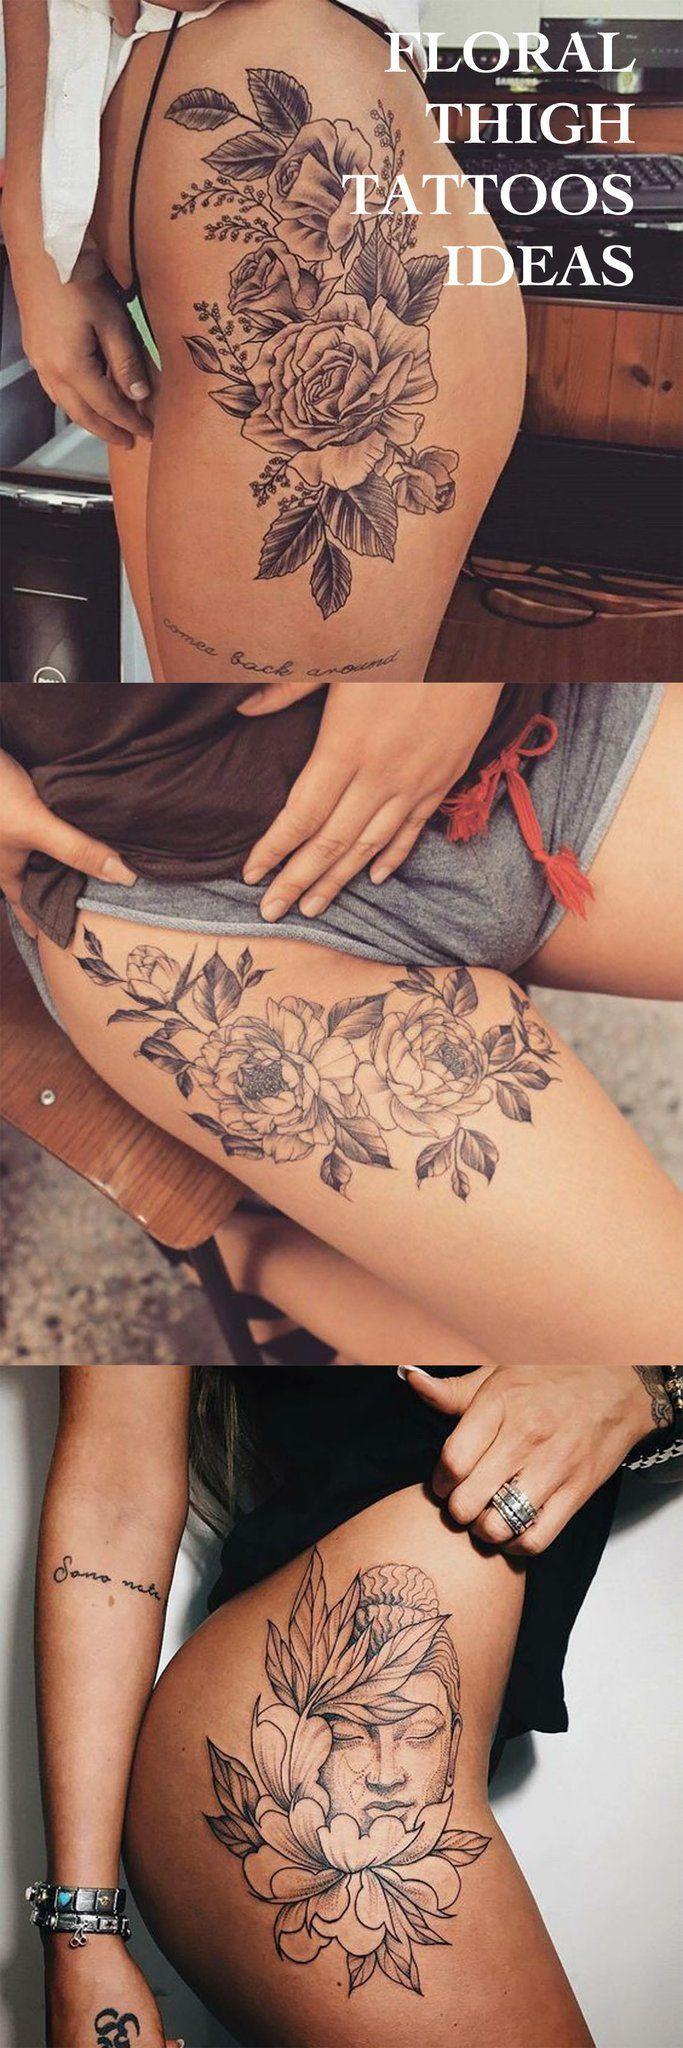 Floral thigh tattoo ideas at mybodiart flower buddha black and